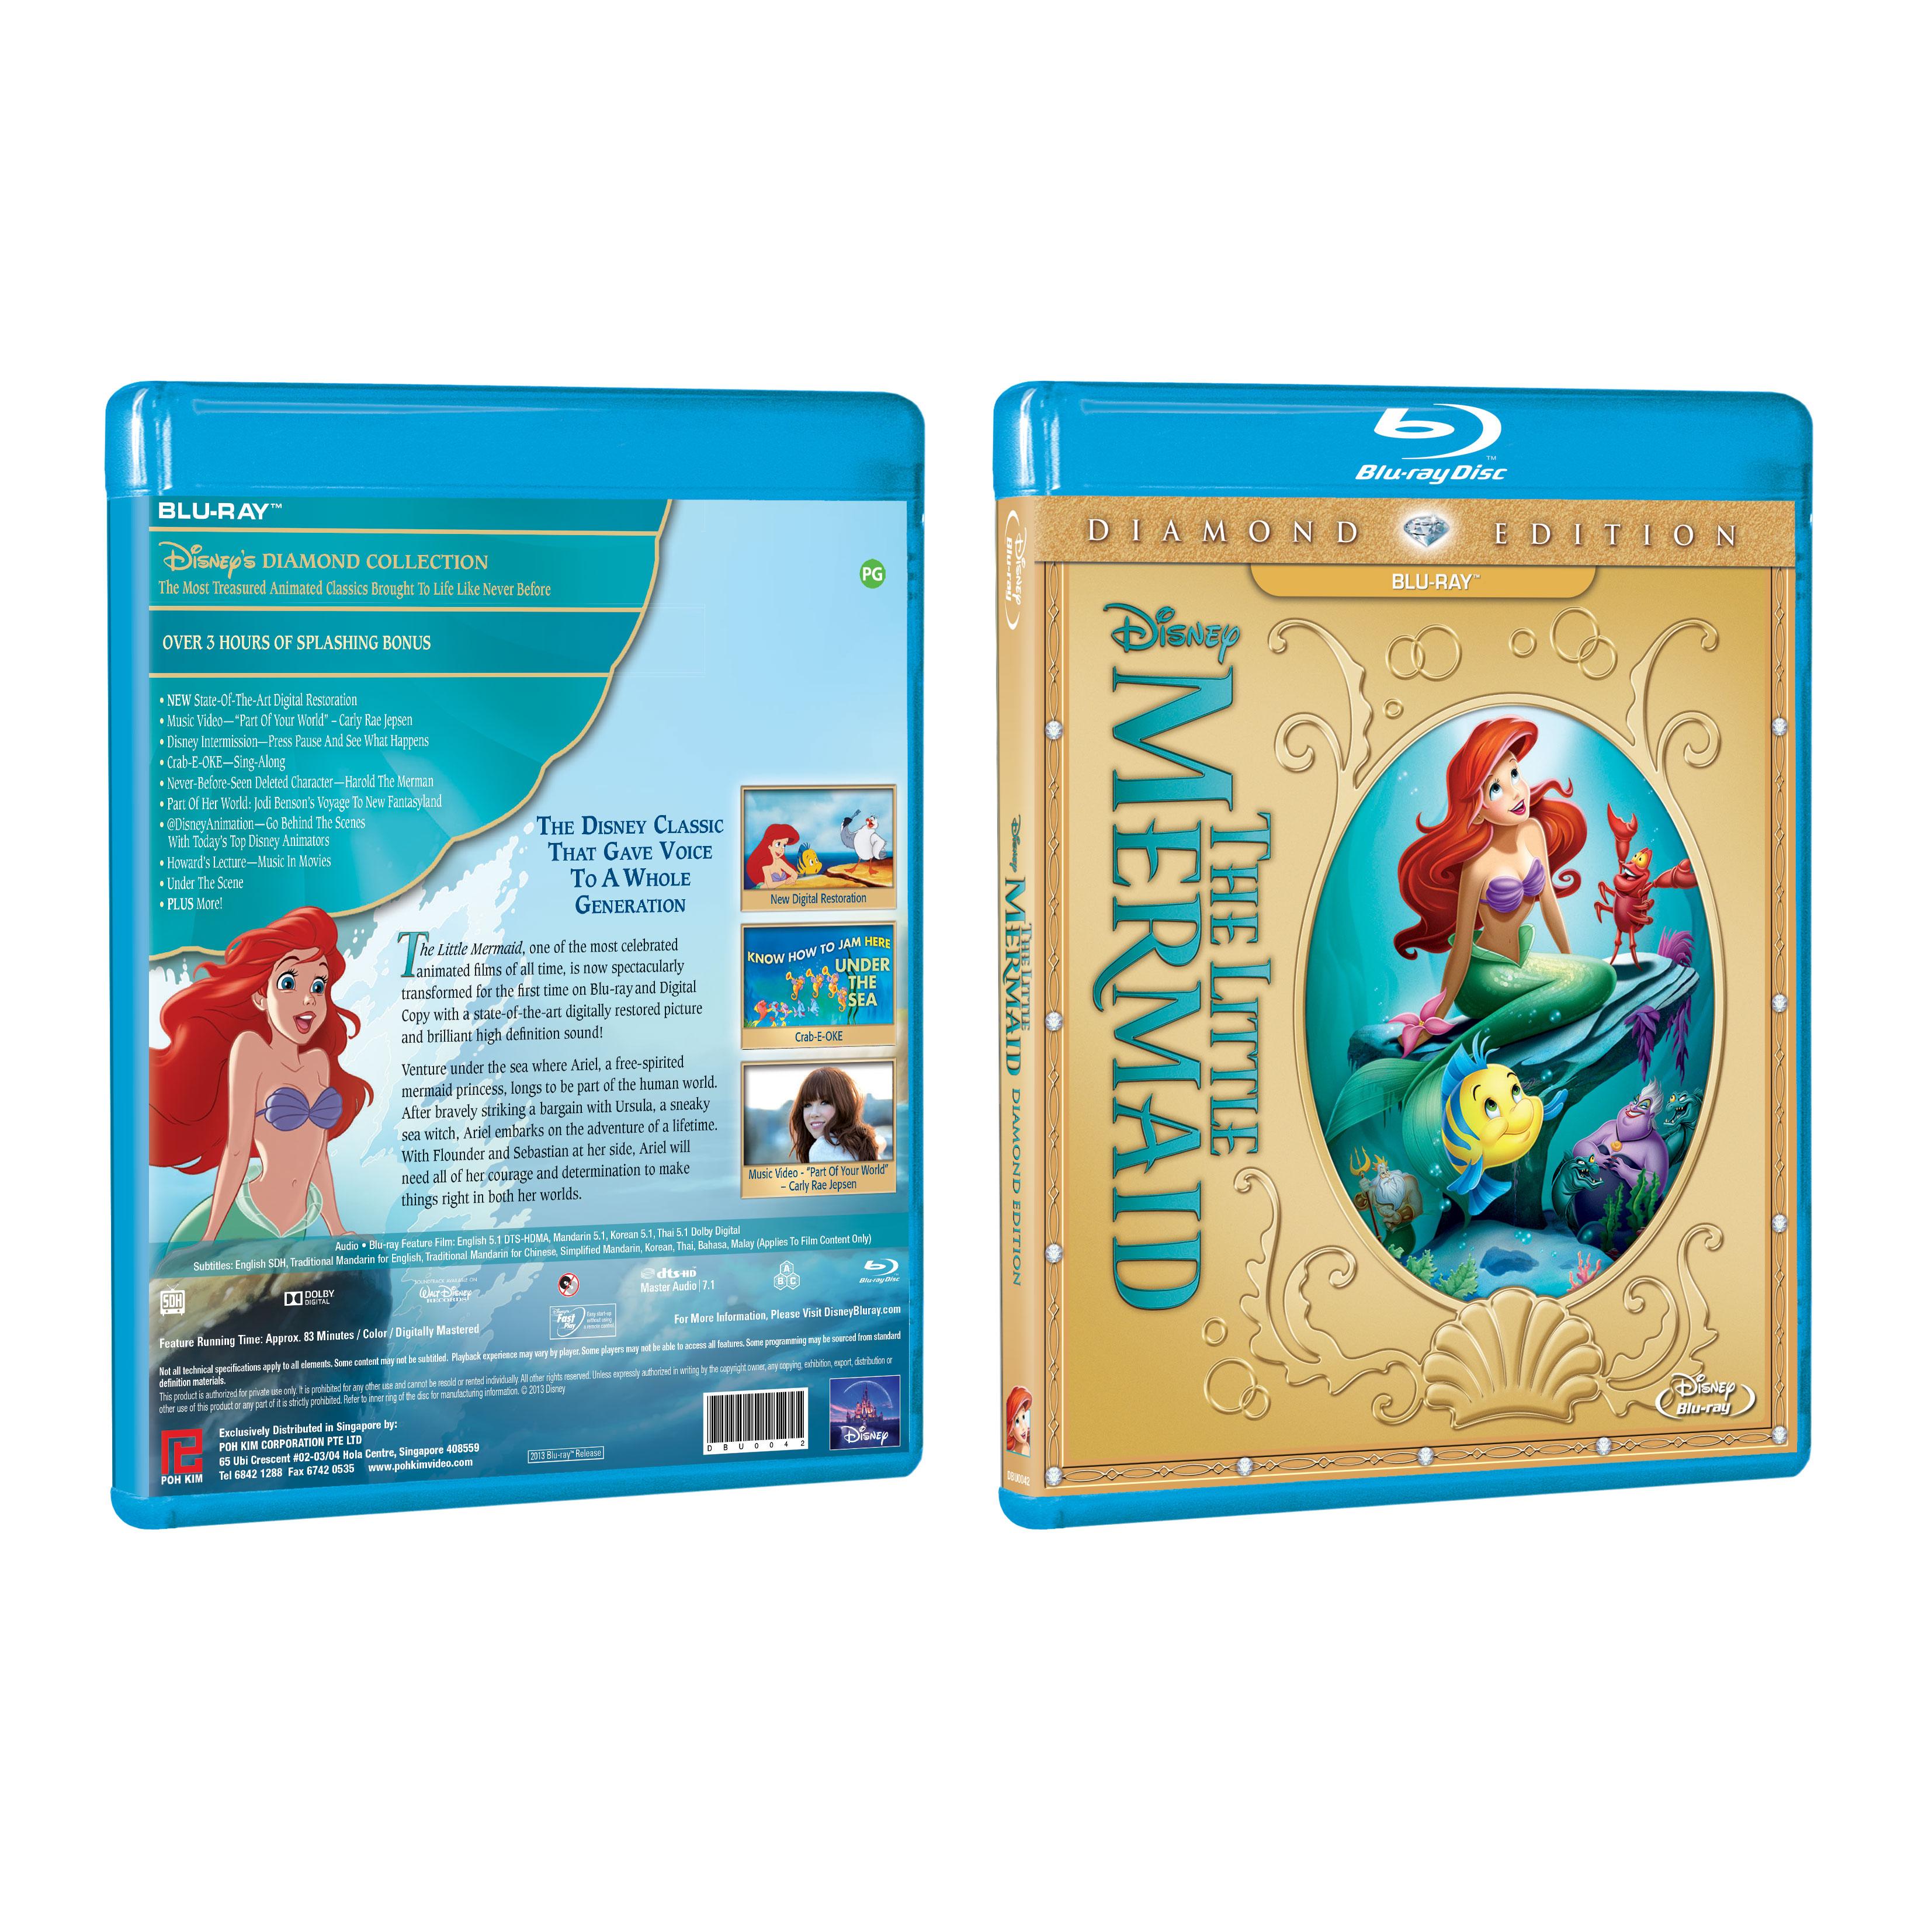 The Little Mermaid: Diamond Edition ? (Blu-ray)